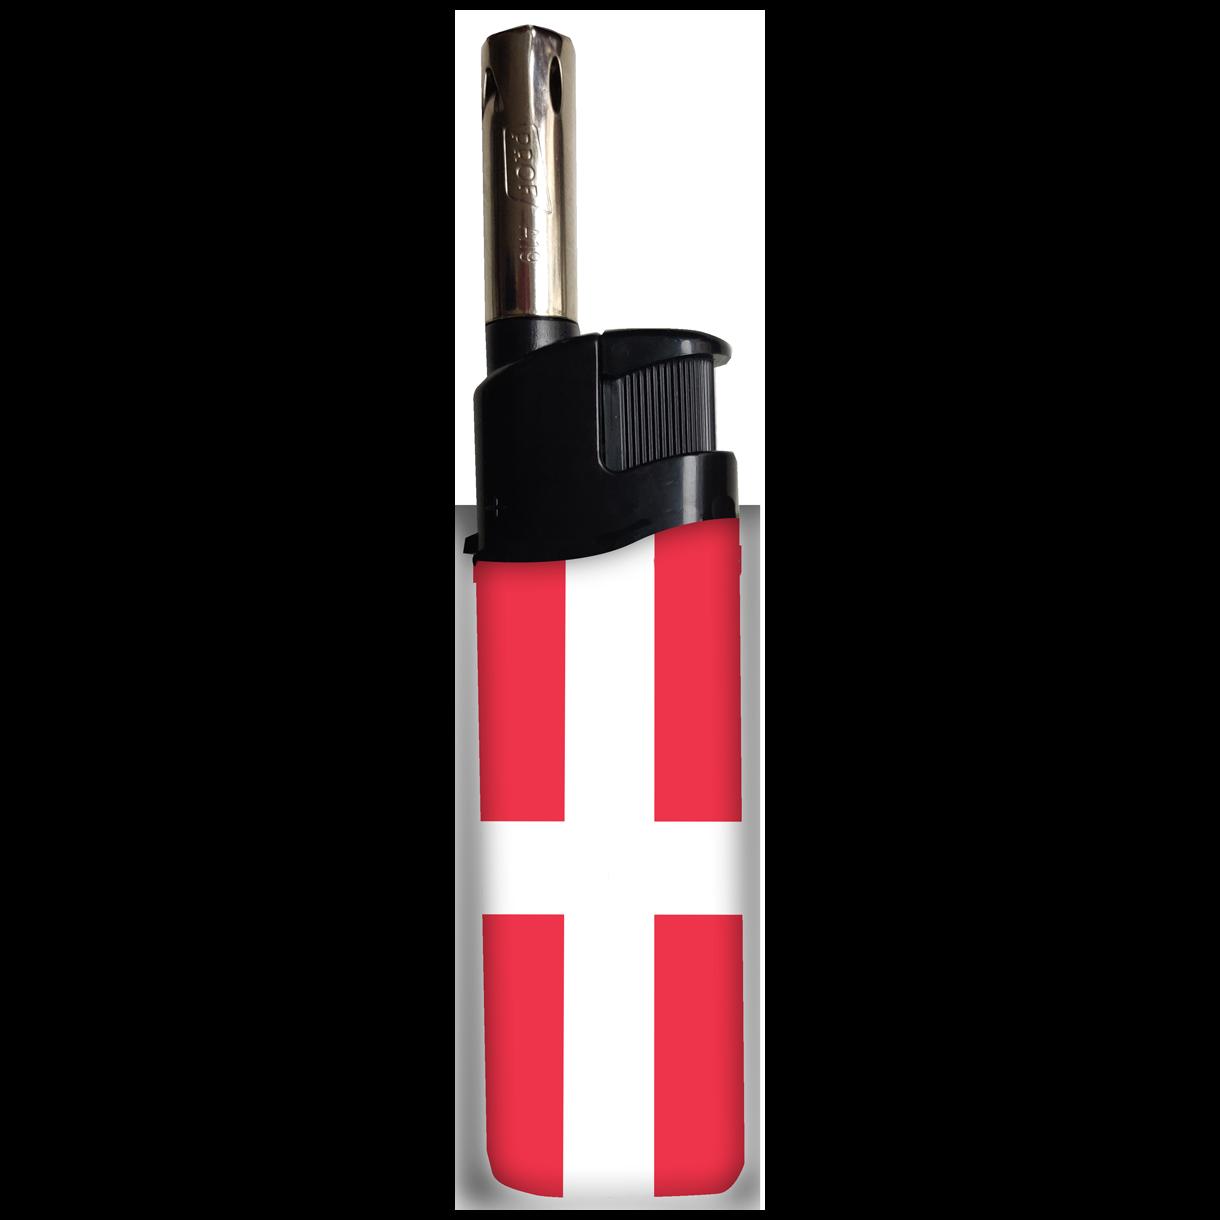 Feuerzeug Dänemark